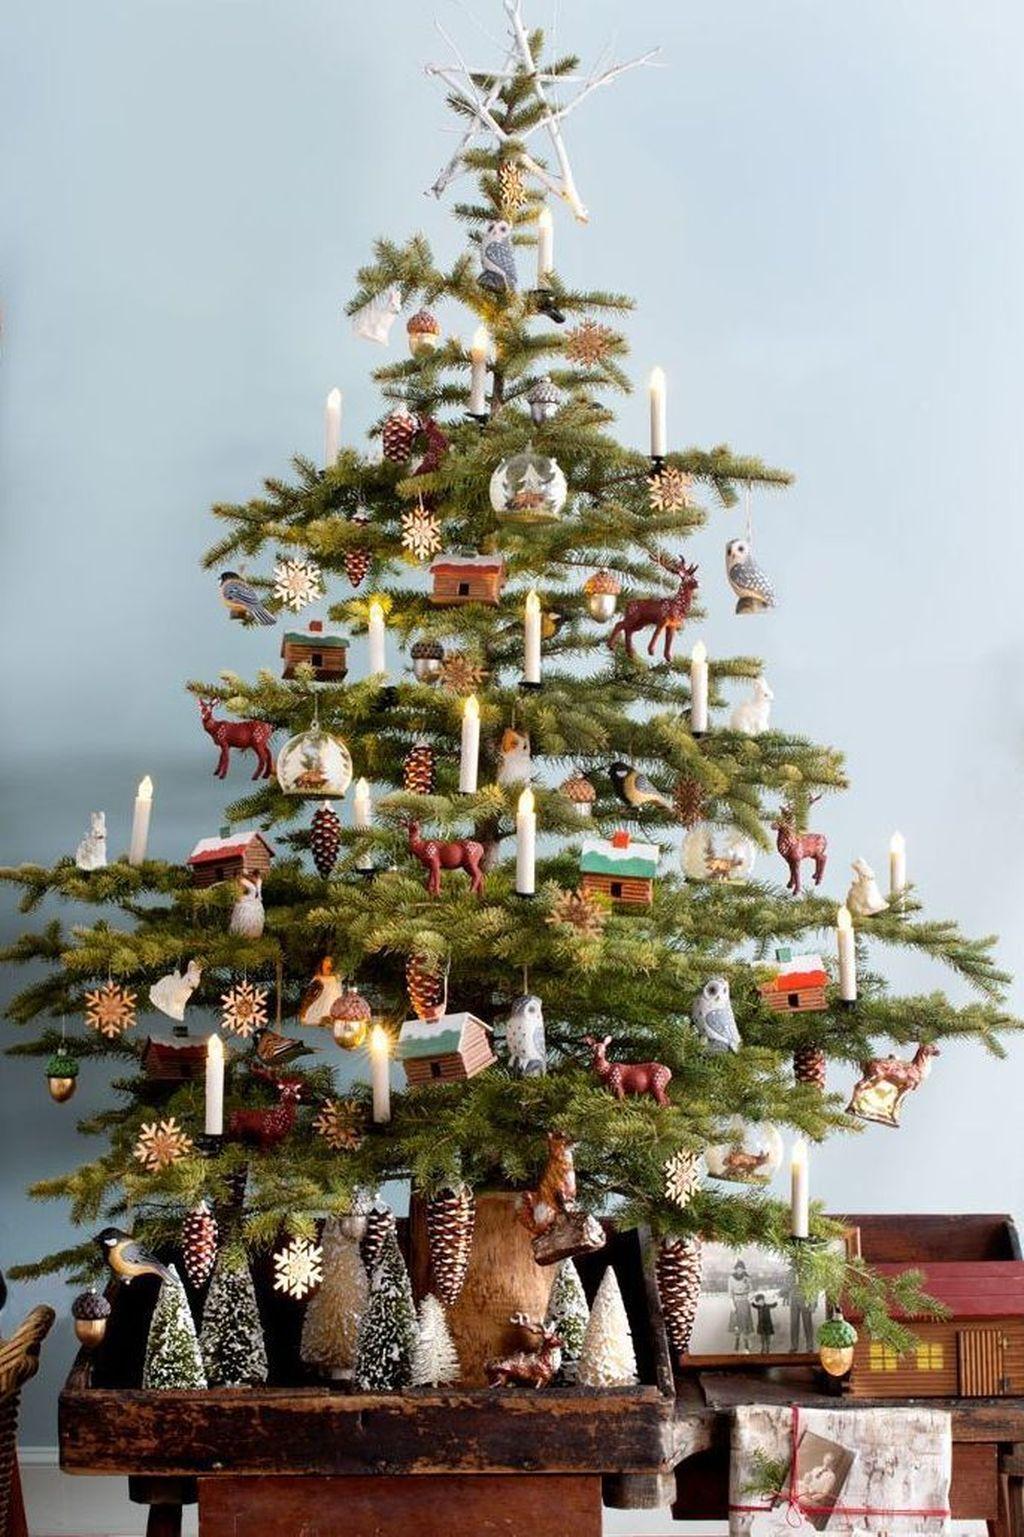 Amazing Winter Christmas Tree Design And Decor Ideas 24